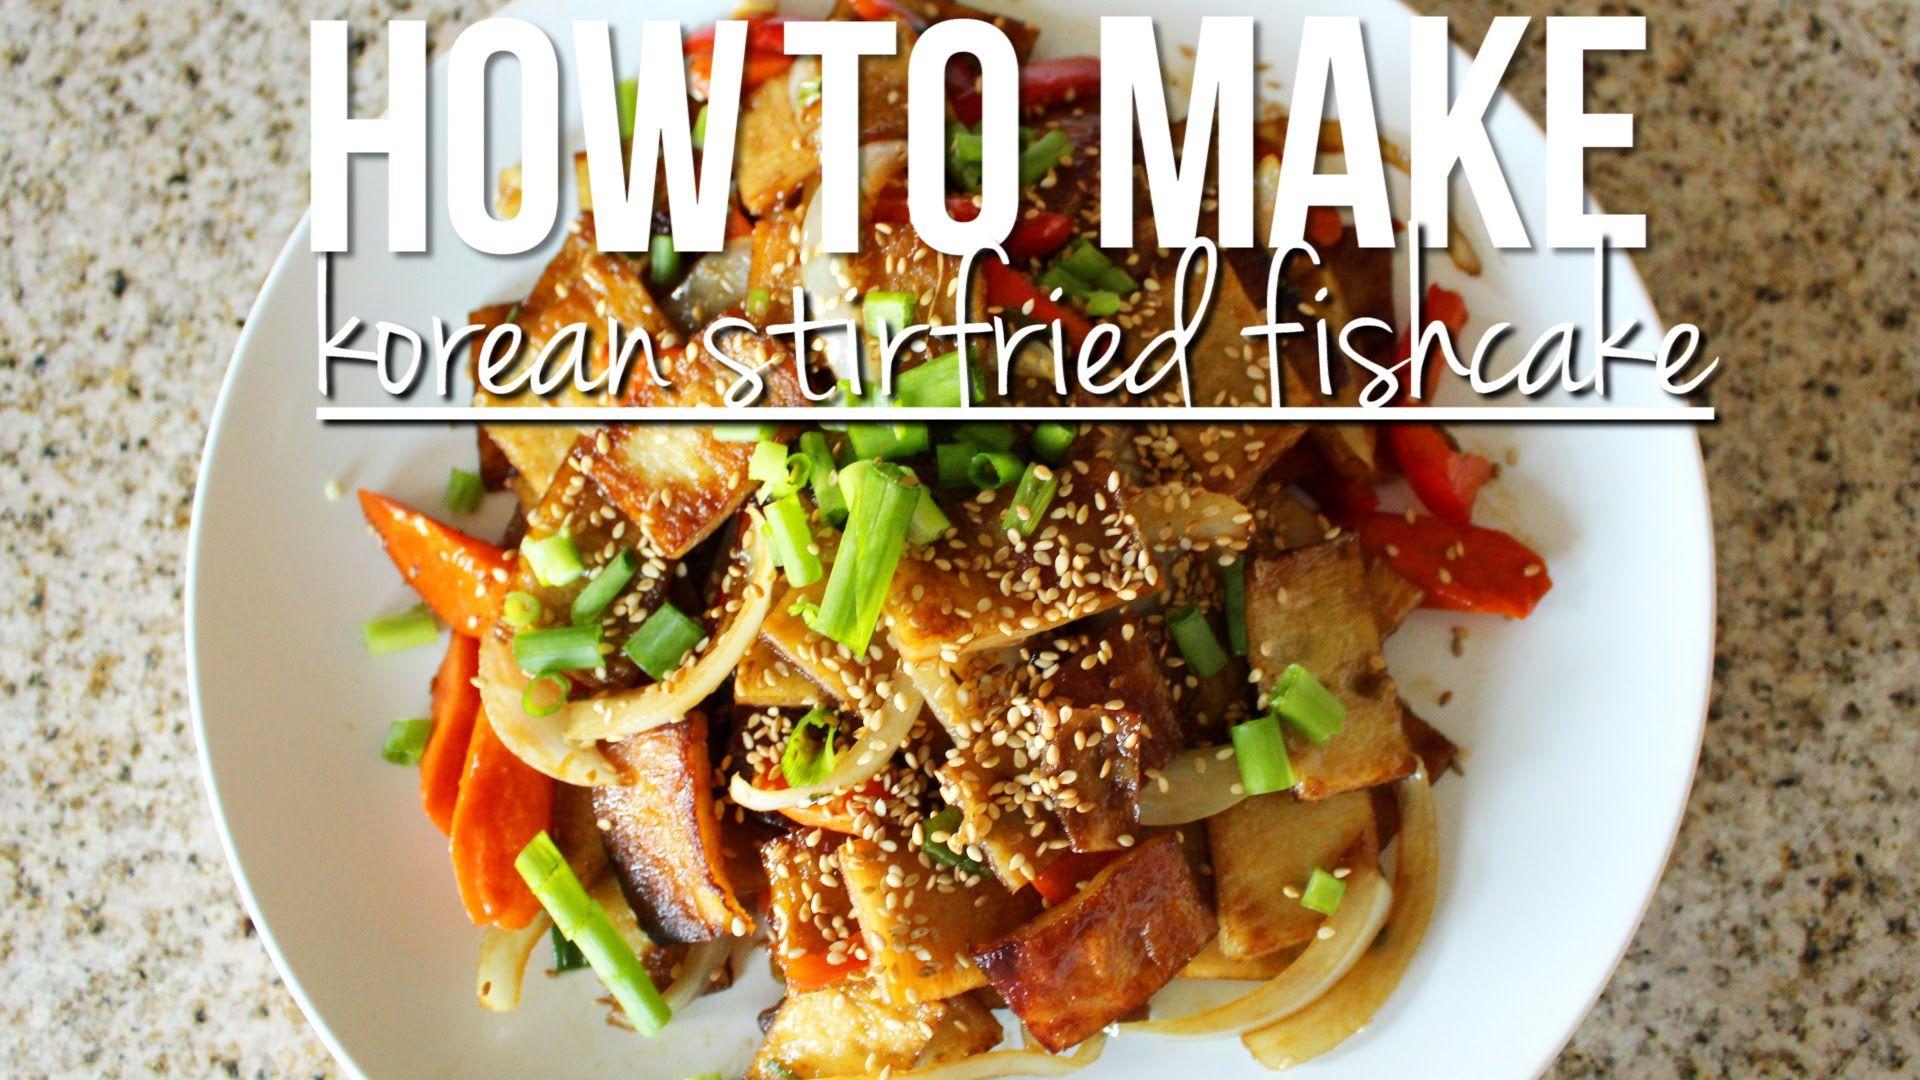 How to make banchan korean stir fried fish cake authentic korean how to make banchan korean stir fried fish cake authentic korean food forumfinder Gallery